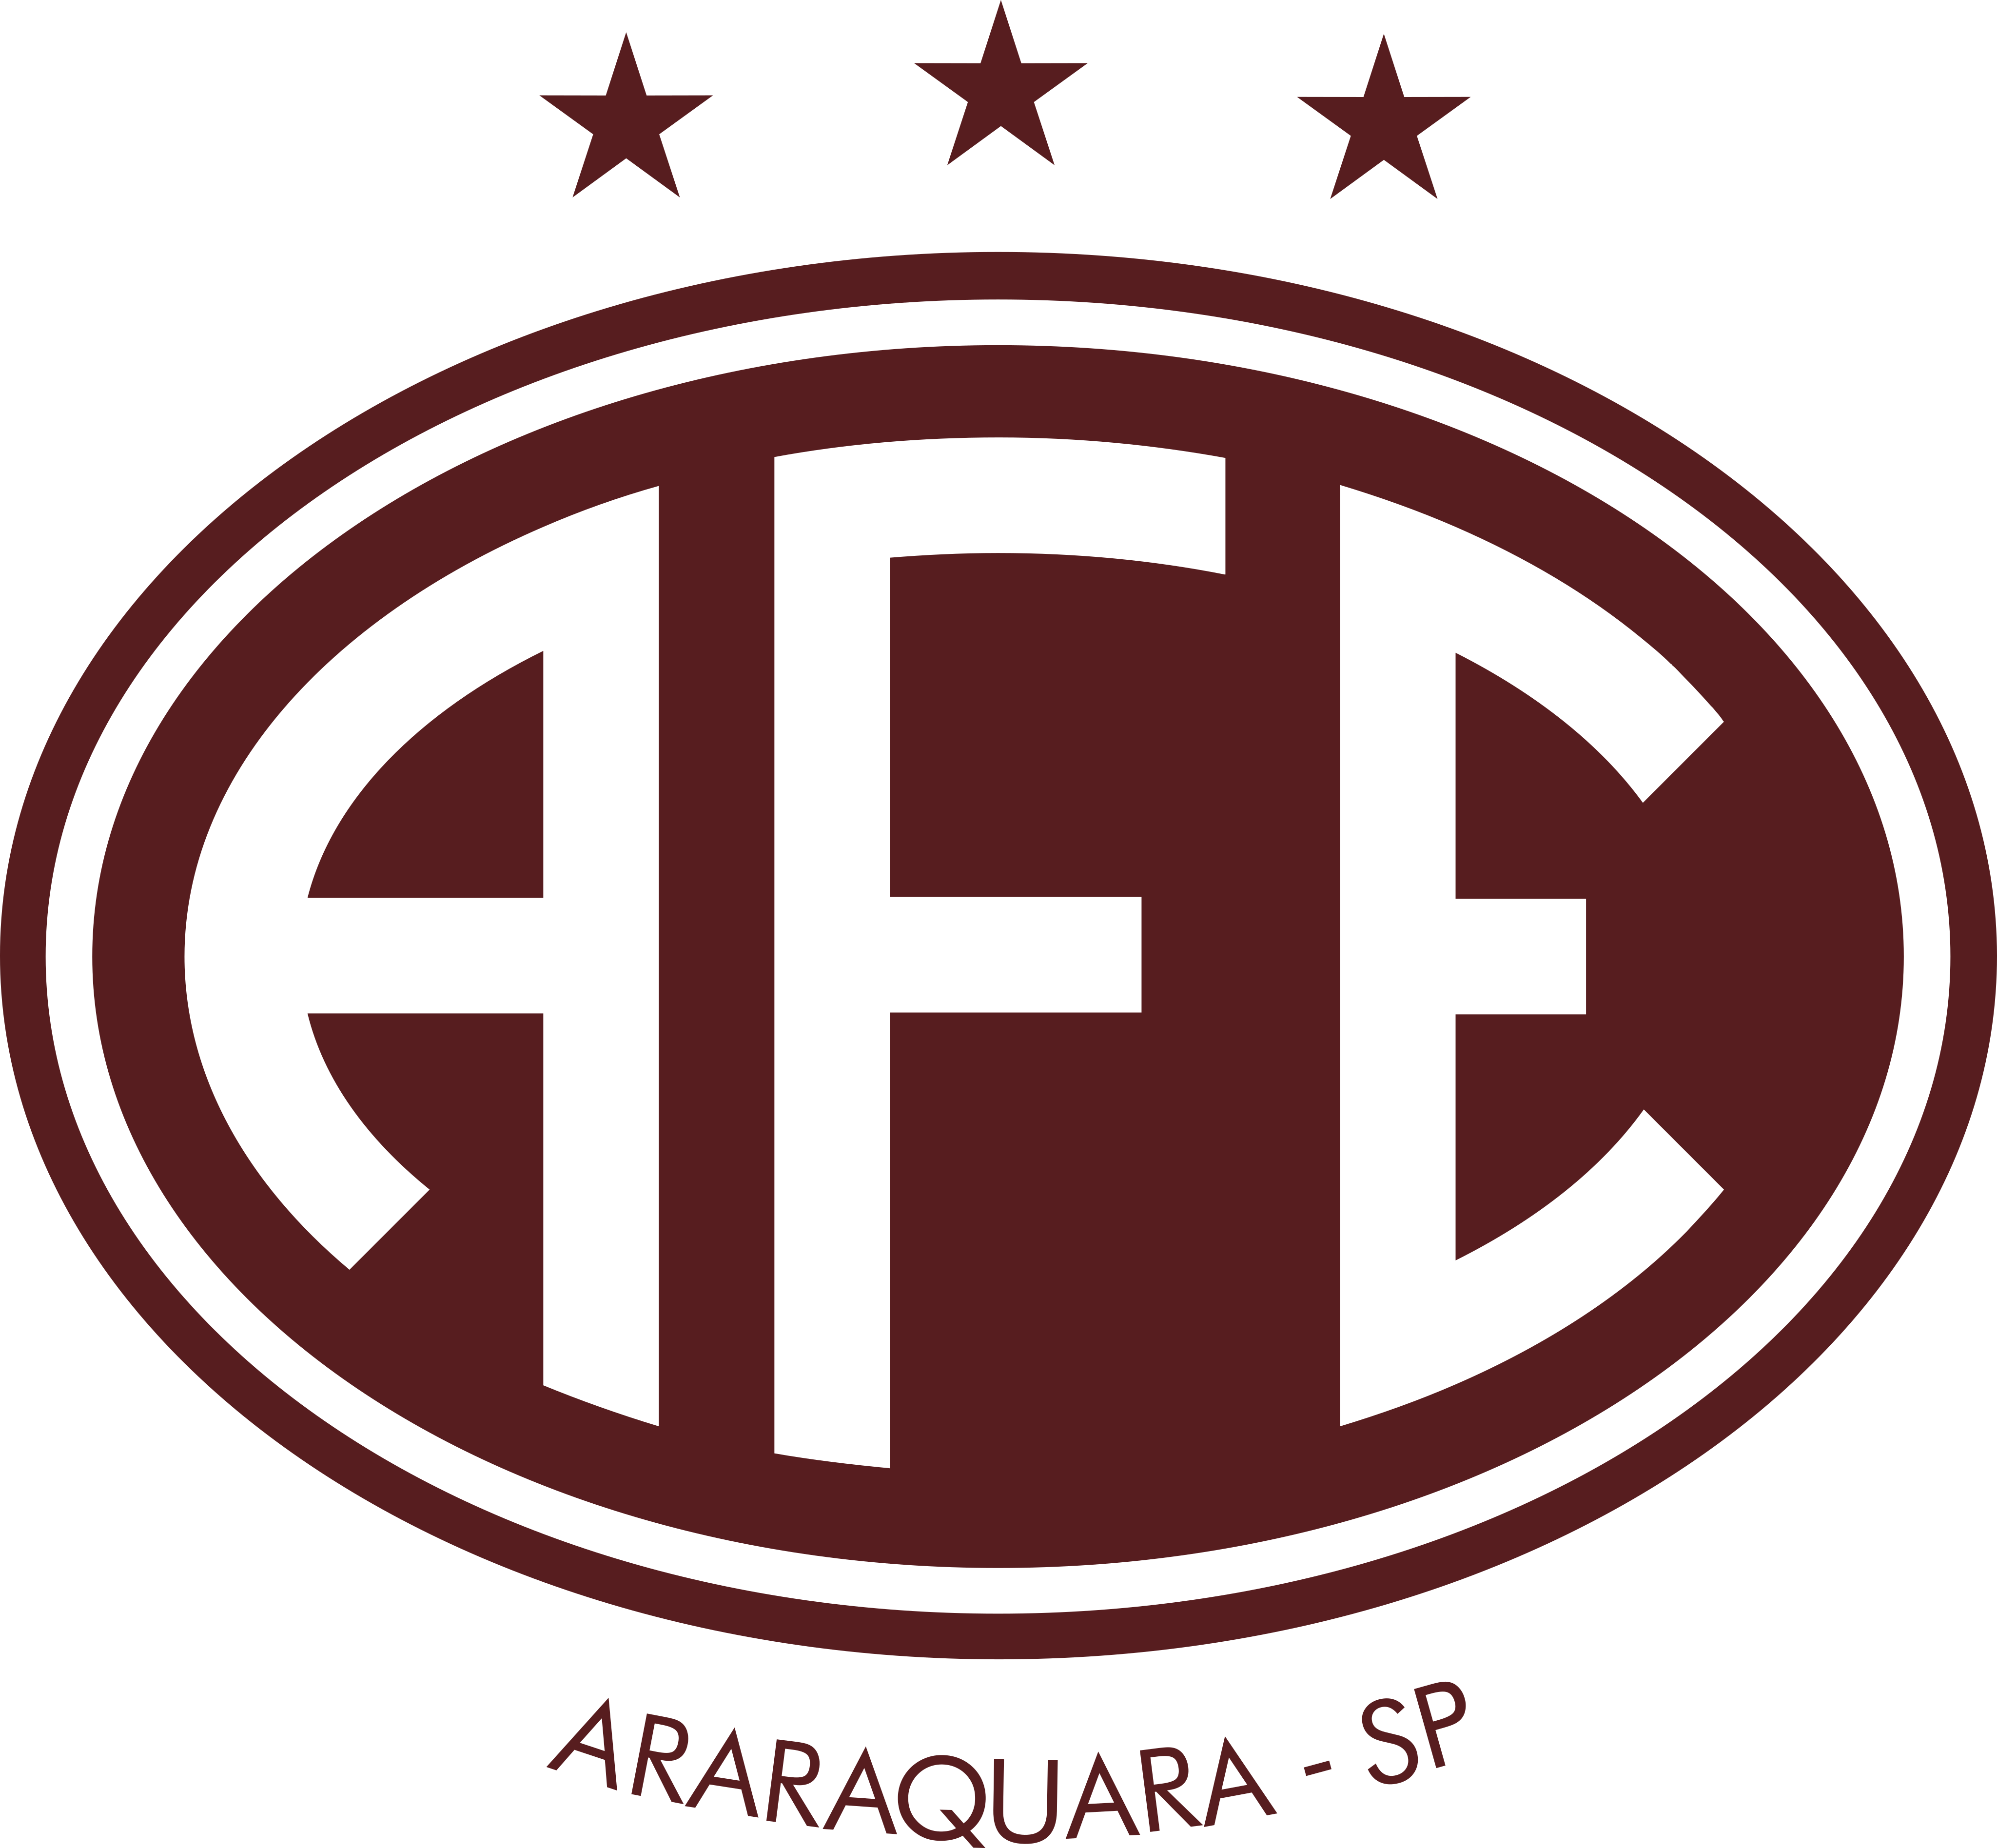 ferroviaria araraquara logo 1 - Ferroviária Araraquara Logo